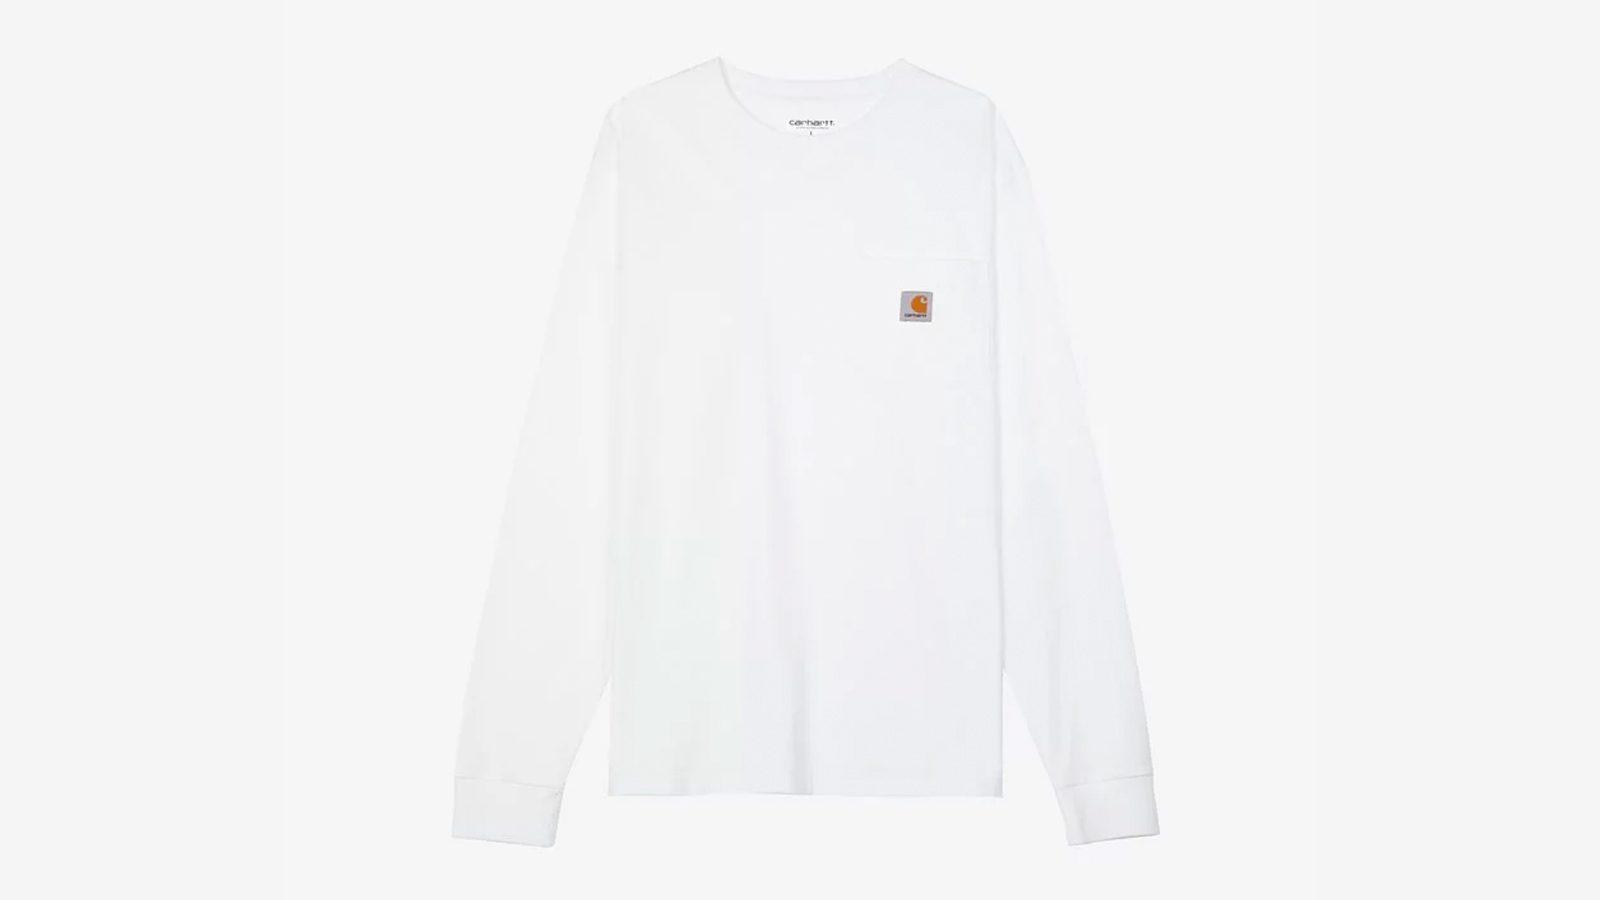 Carhartt L:S Pocket T-Shirt